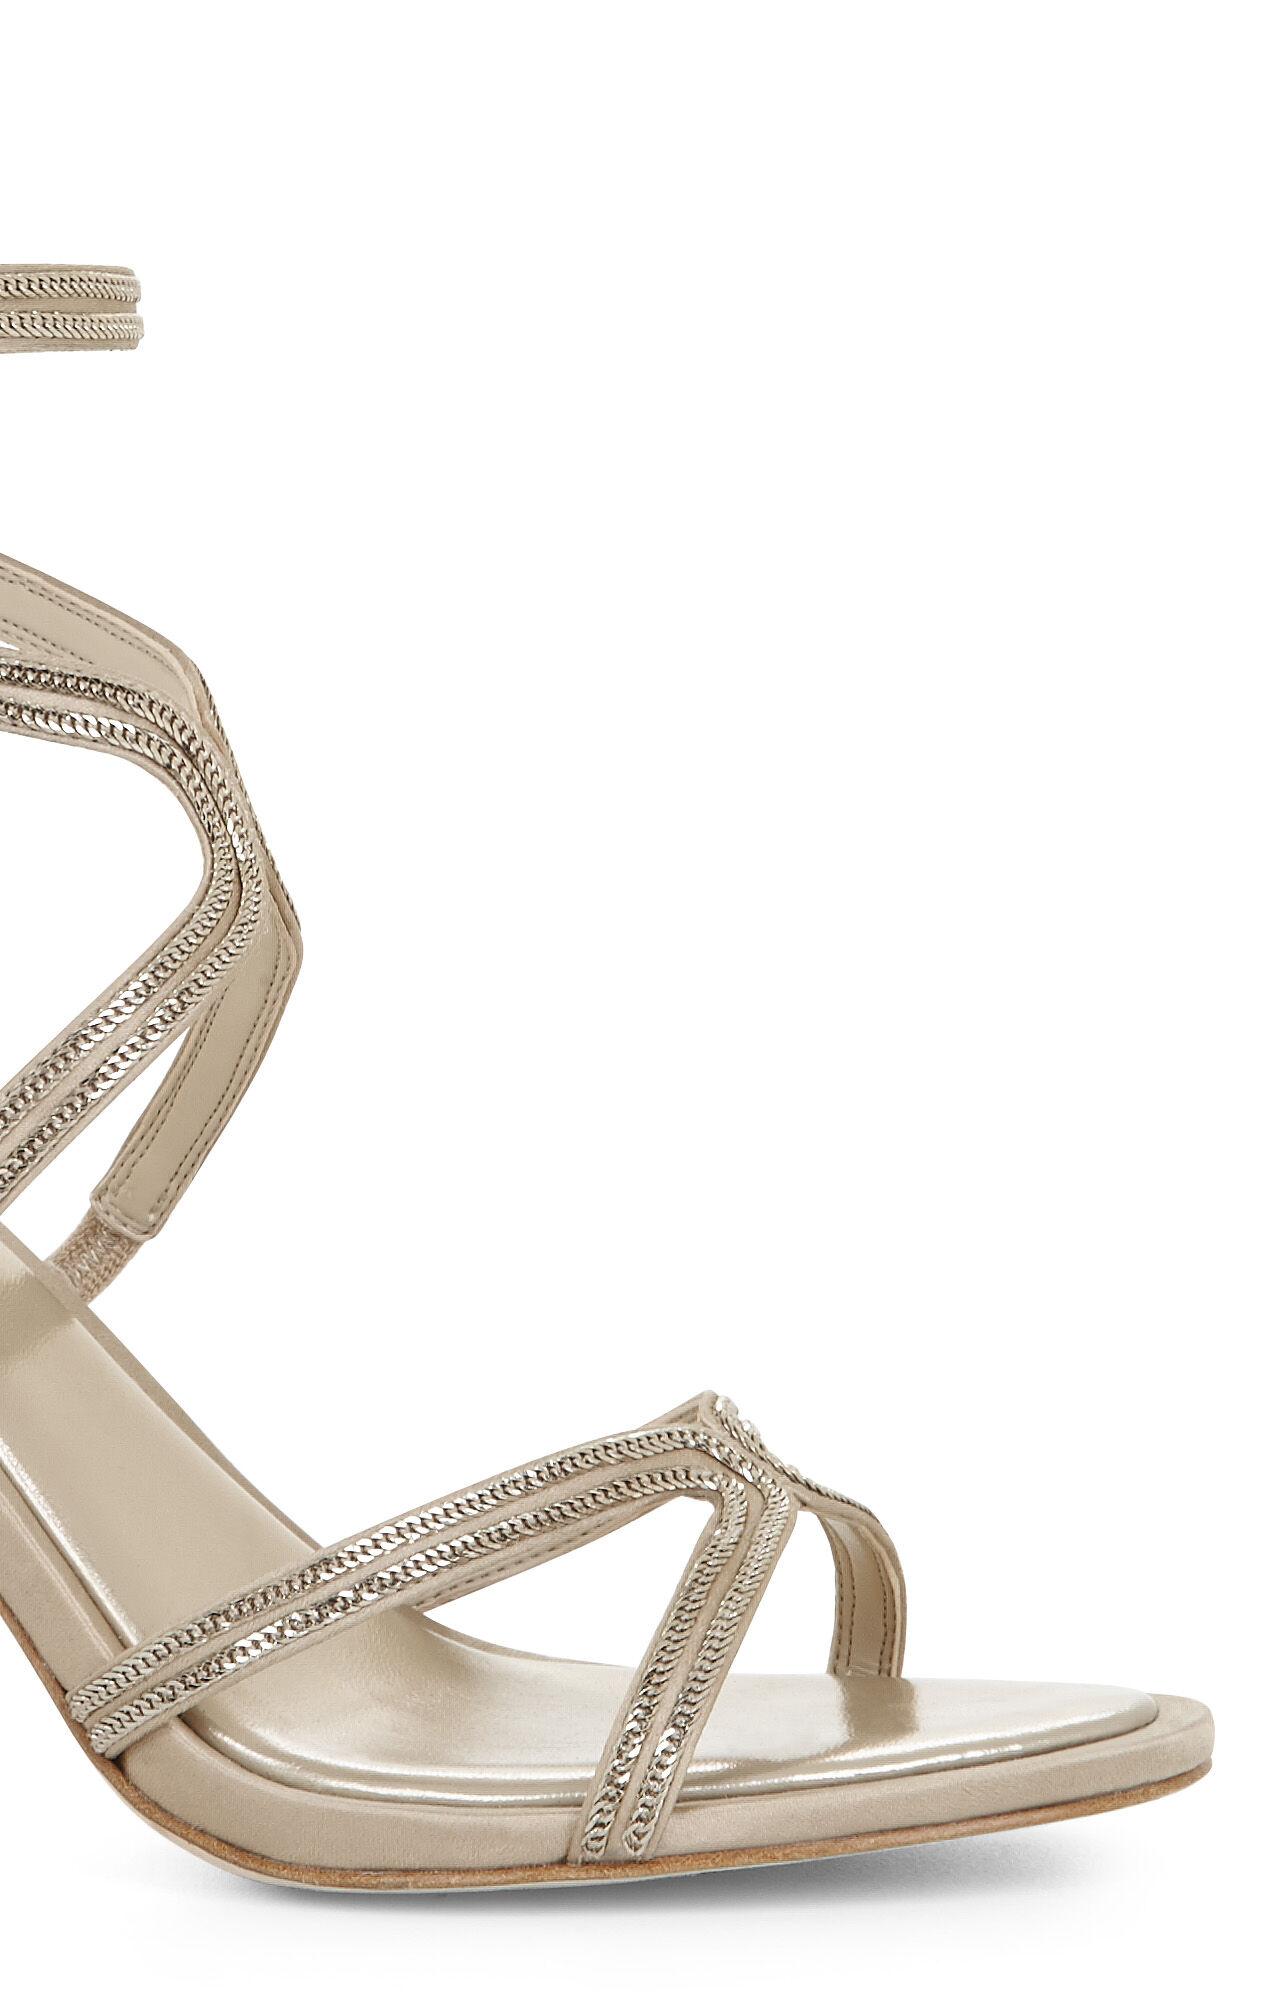 Primp High-Heel Sandal